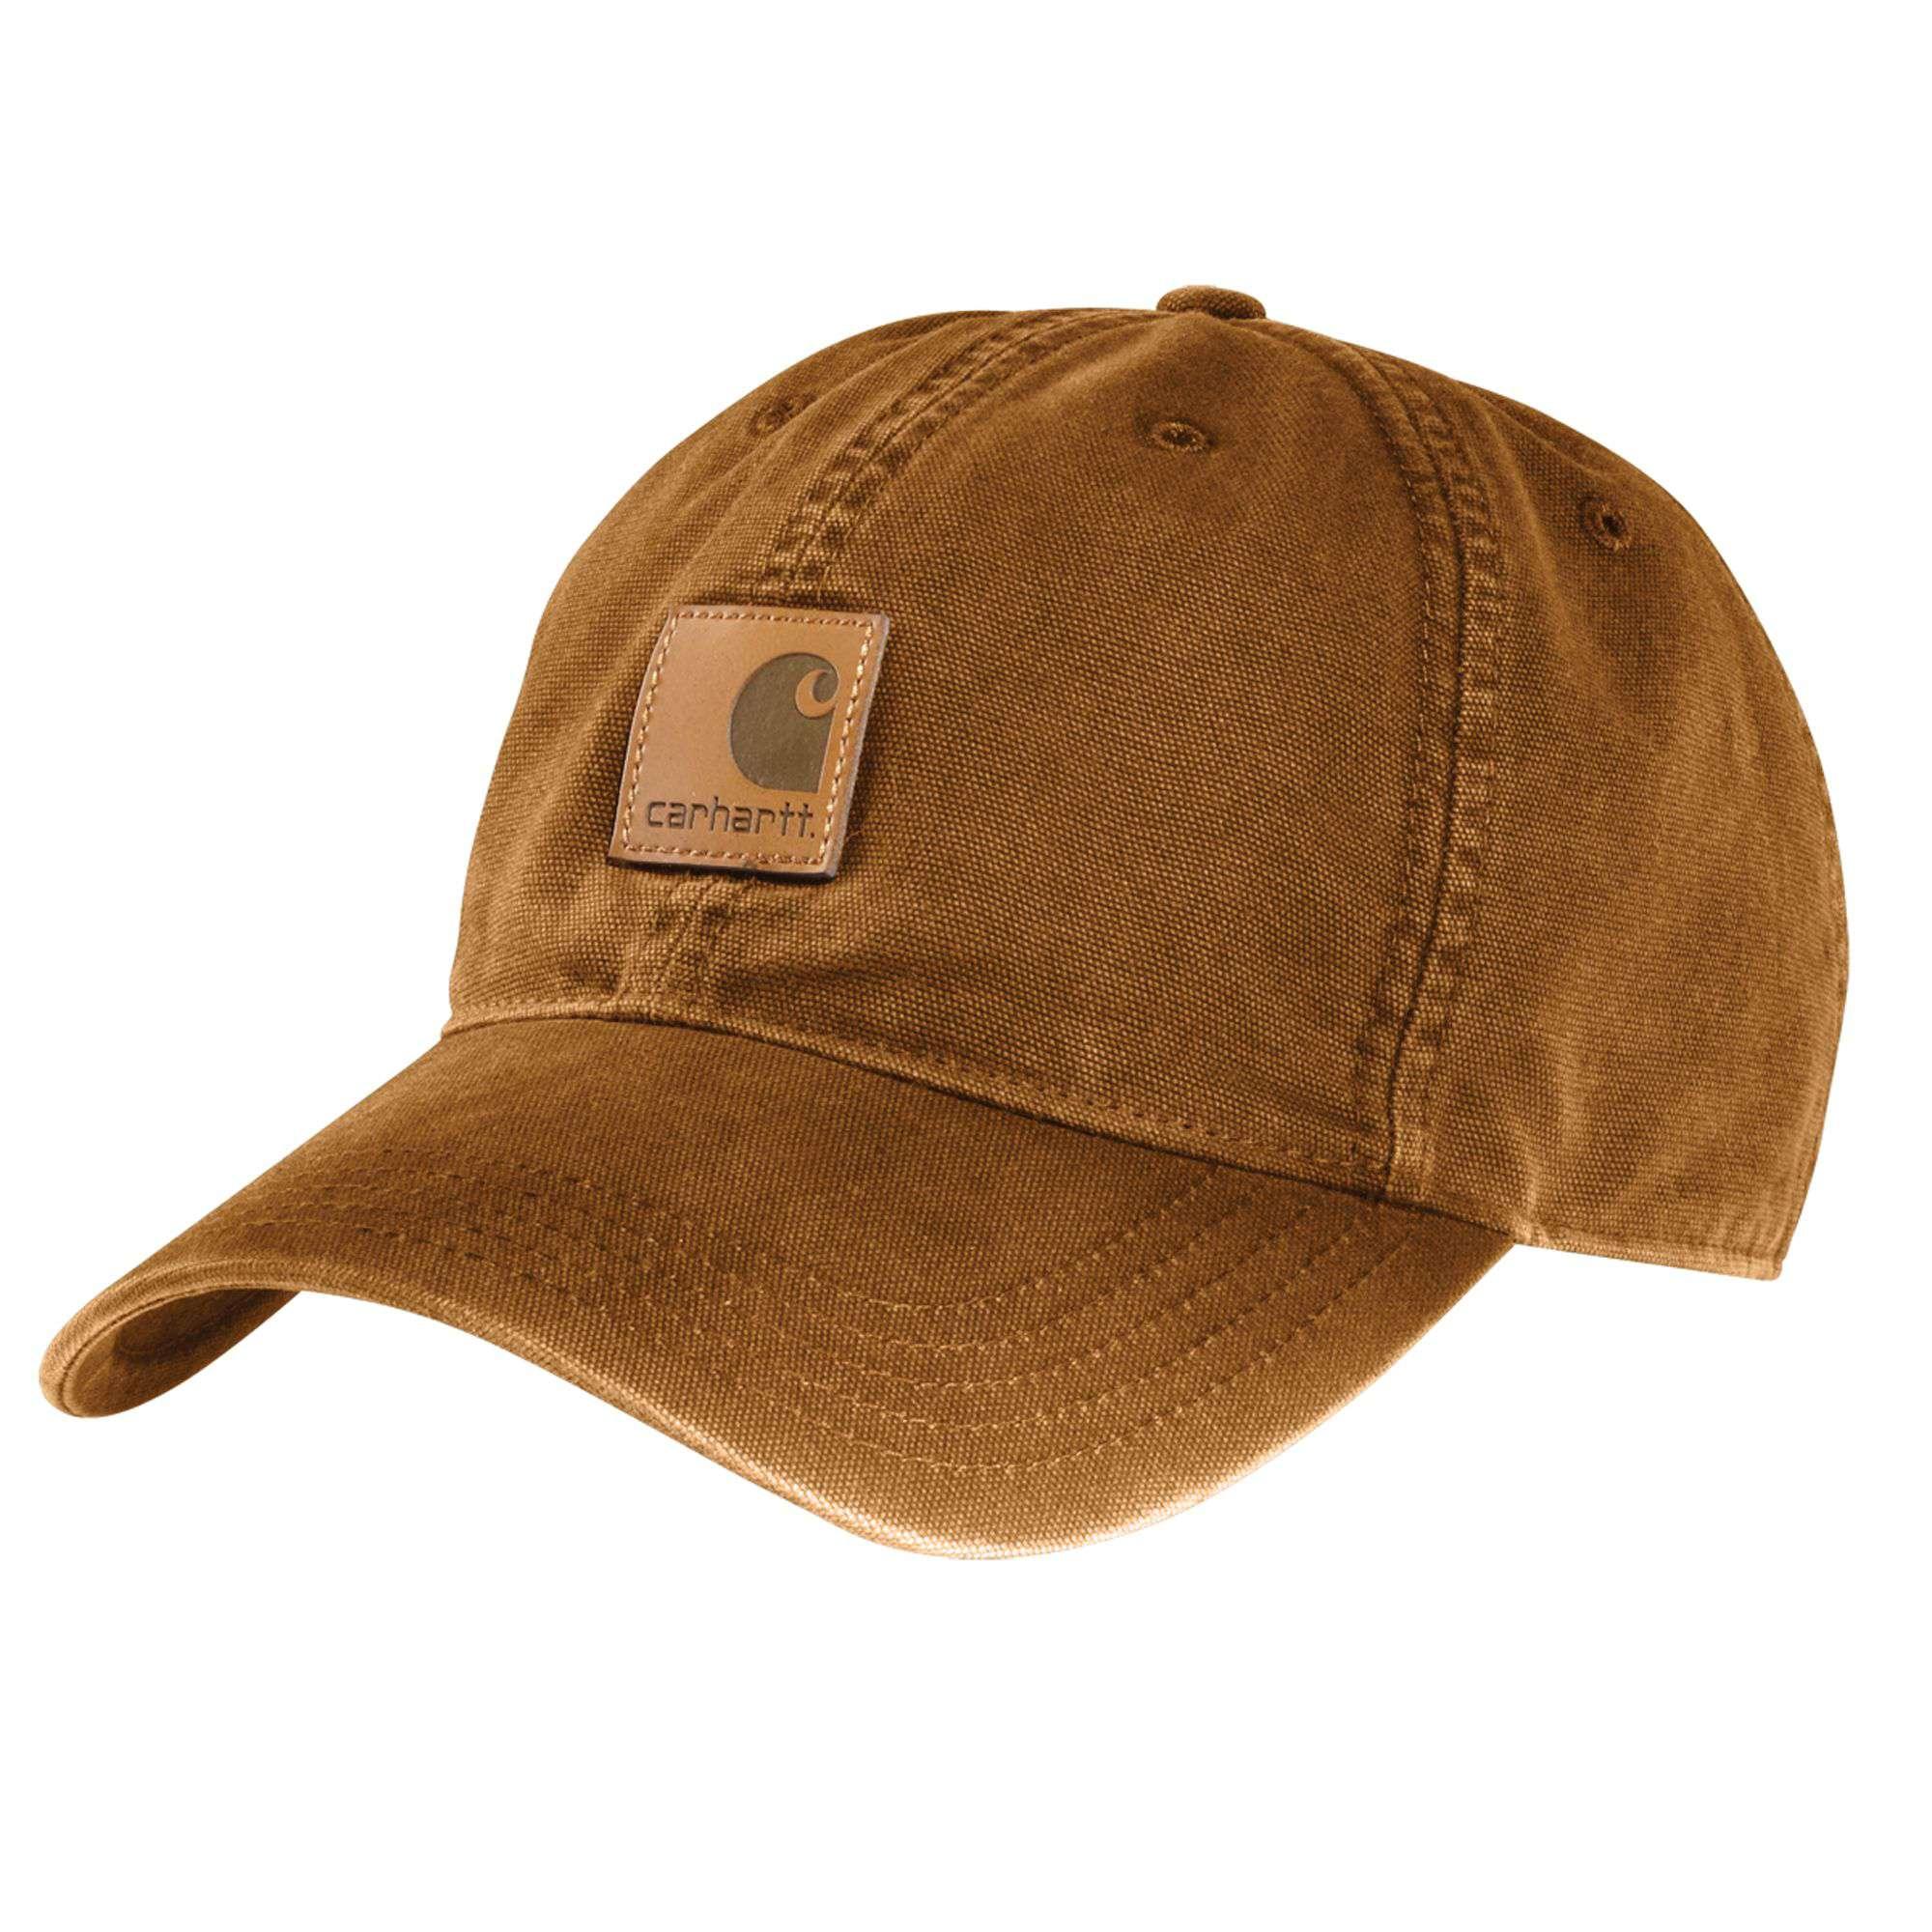 M Cotton Canvas Cap, Brown, swatch